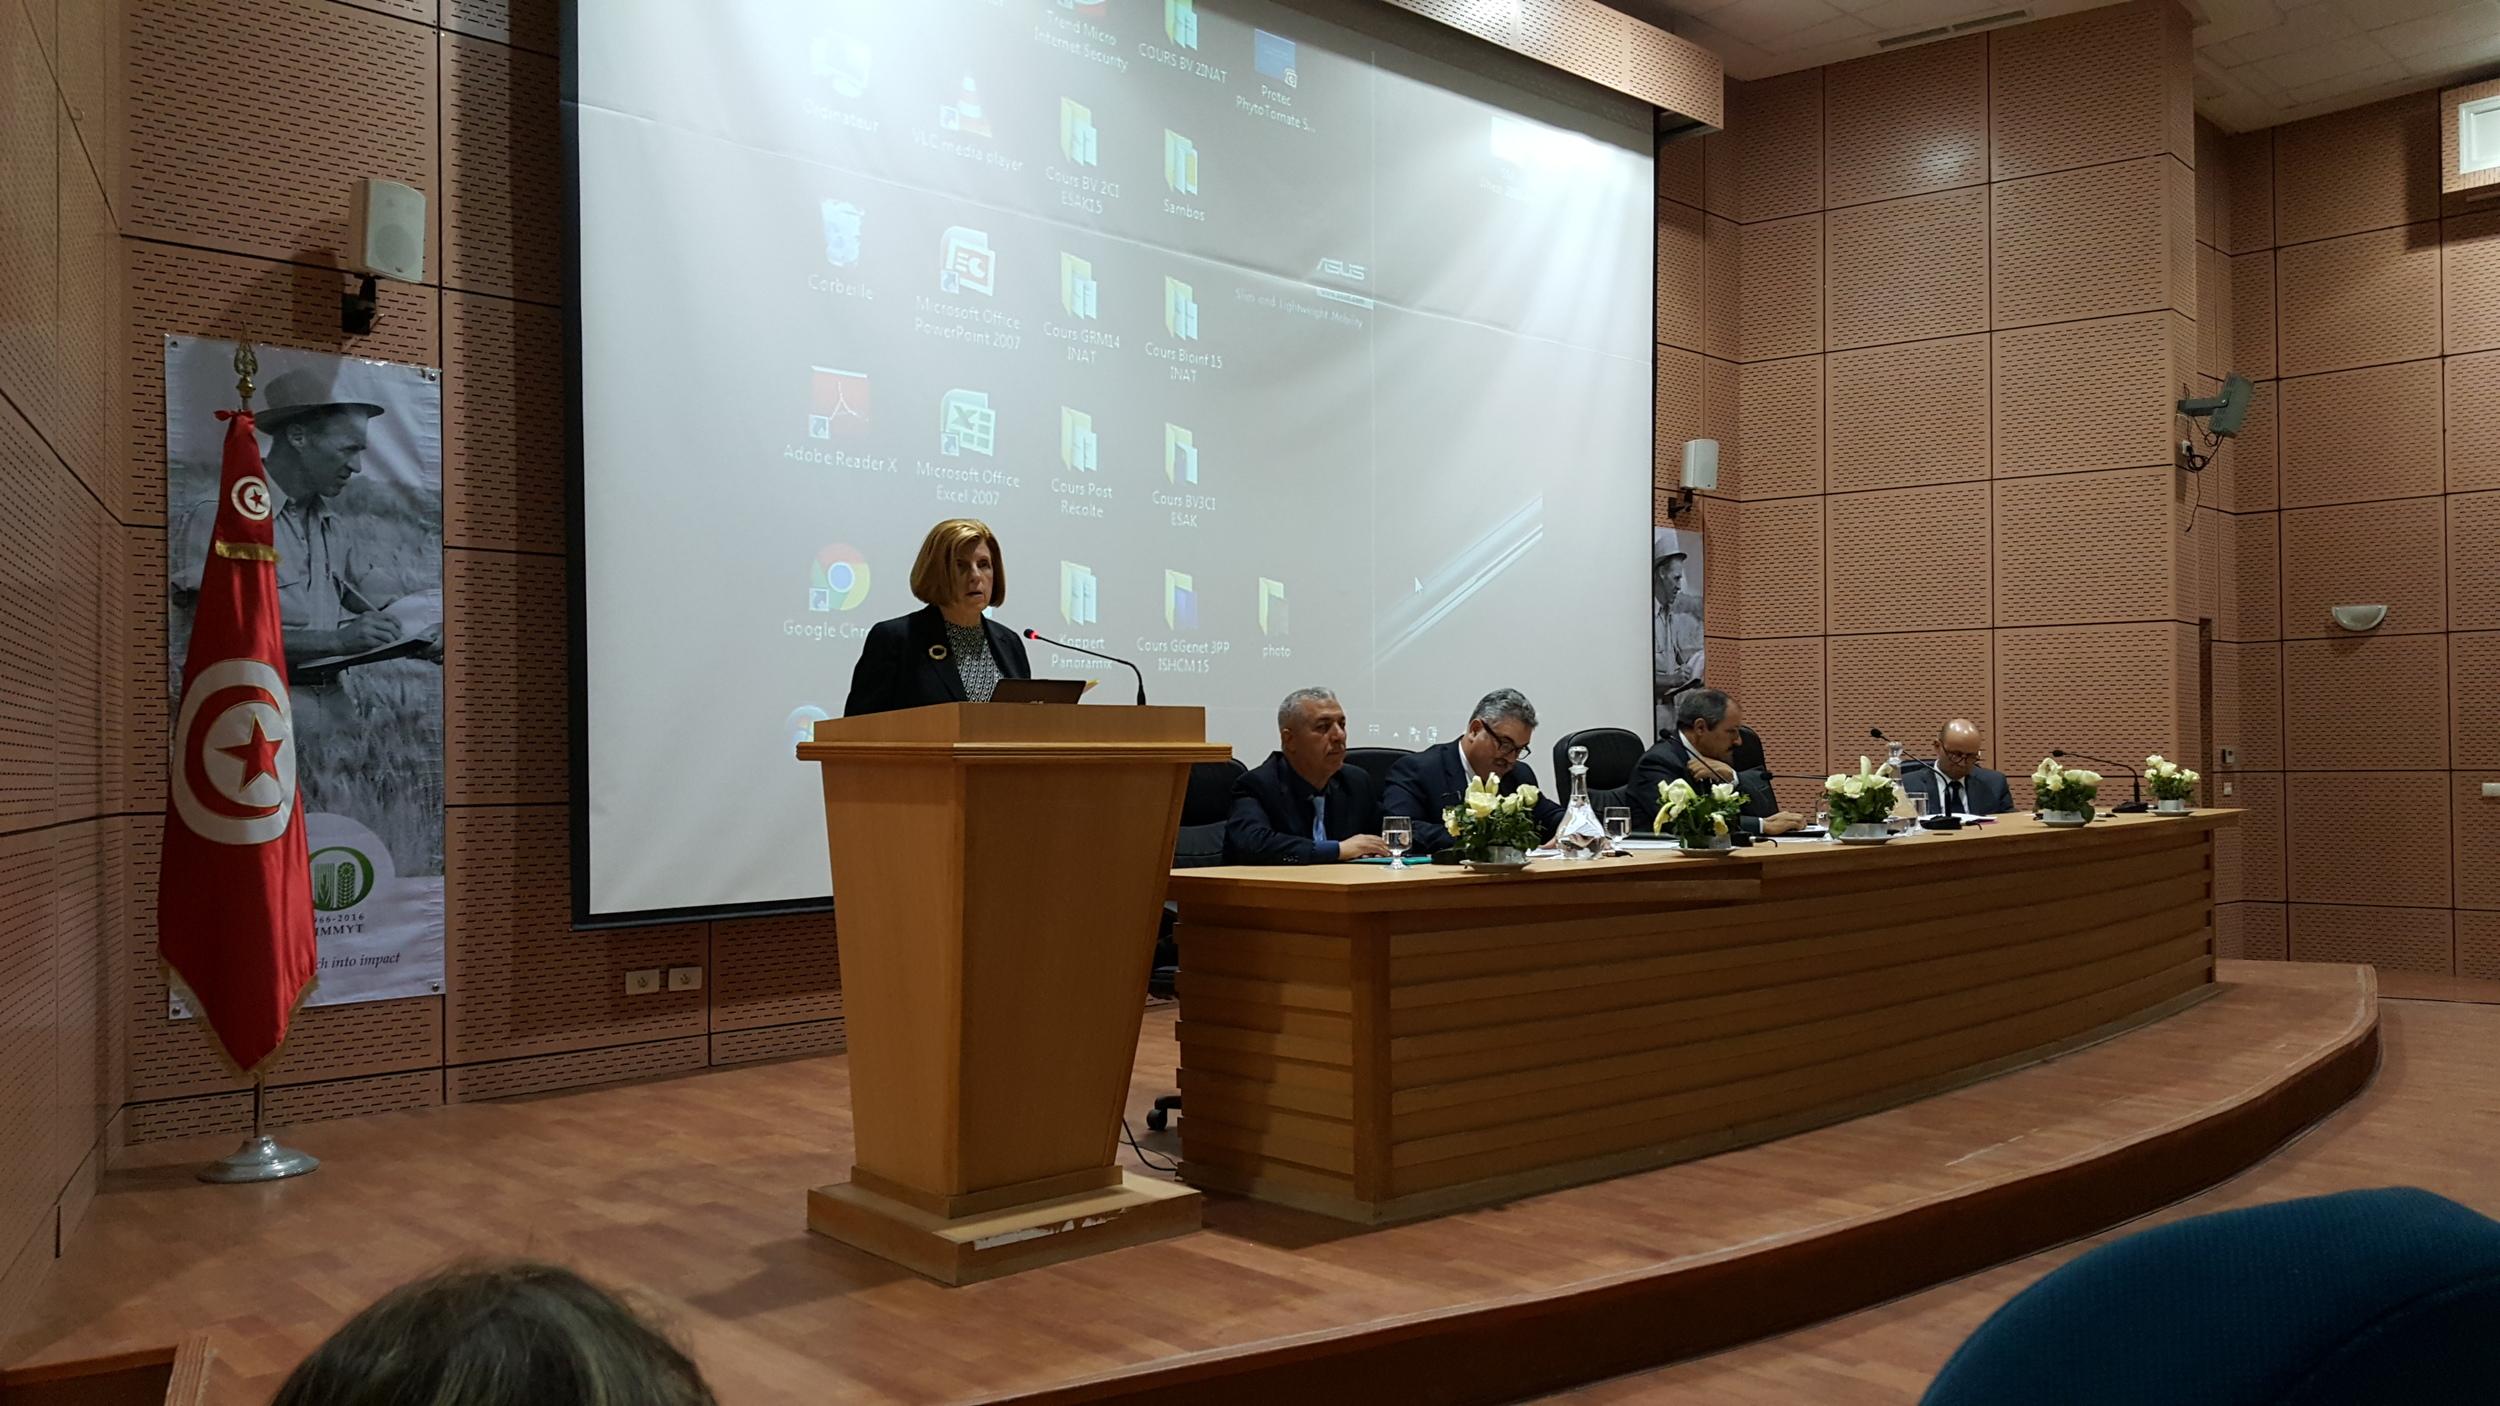 Jeanie Boralug Laube opening the workshop